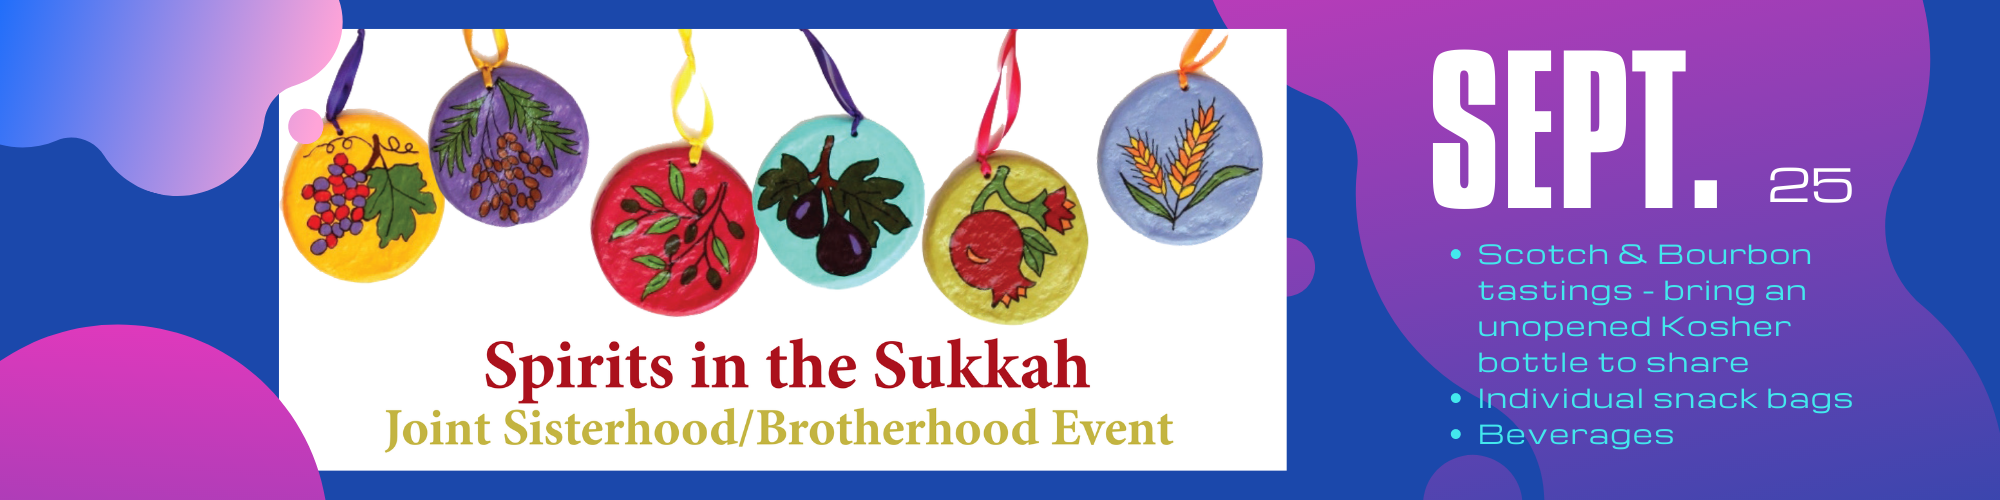 "<a href=""http://kellywalsh.space/sisterhood/event/sisterhood-brotherhood-sukkah-hop-2-2-3-2-copy/""                                     target="""">                                                                 <span class=""slider_title"">                                     Spirits in the Sukkah                                </span>                                                                 </a>                                                                                                                                                                                       <span class=""slider_description"">Saturday, September 25, 2021, at 8:00 p.m. Adath Israel Sukkah Plaza</span>                                                                                     <a href=""http://kellywalsh.space/sisterhood/event/sisterhood-brotherhood-sukkah-hop-2-2-3-2-copy/"" class=""slider_link""                             target="""">                             More information and to register!                            </a>"